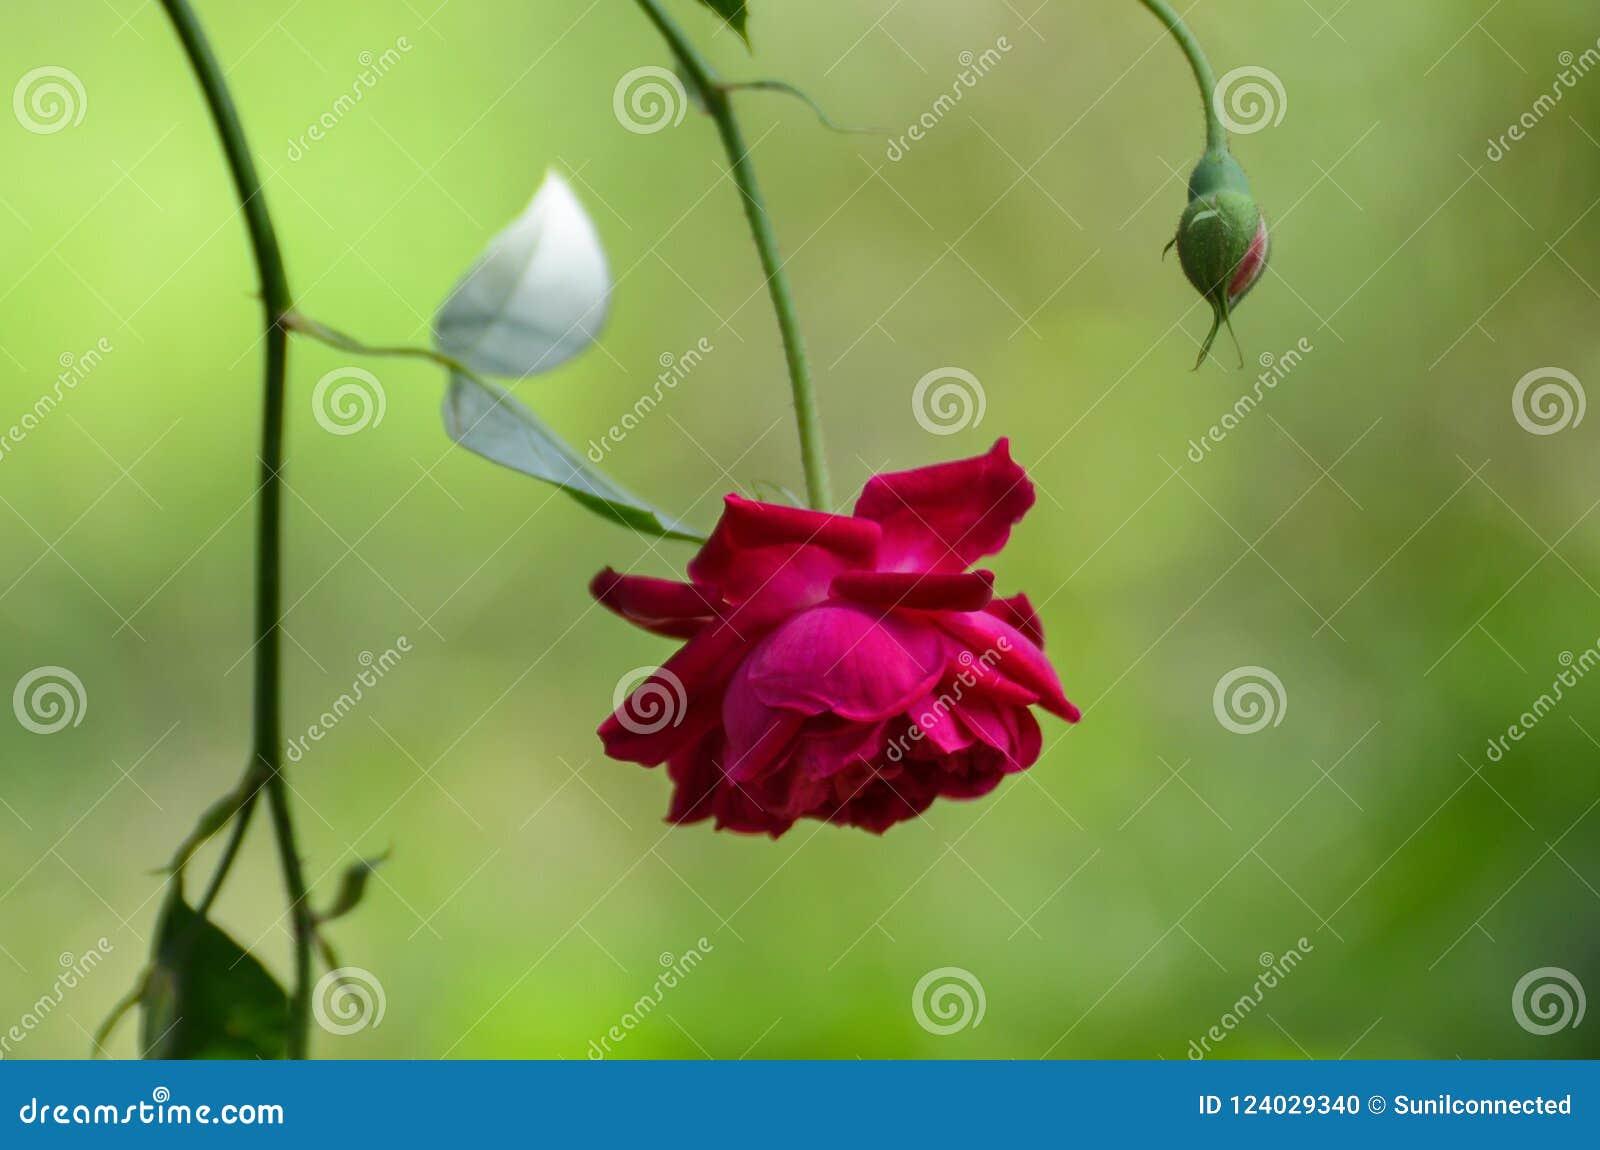 Beautiful Red Rose Hanging Upside Down Stock Photo Image Of Rose